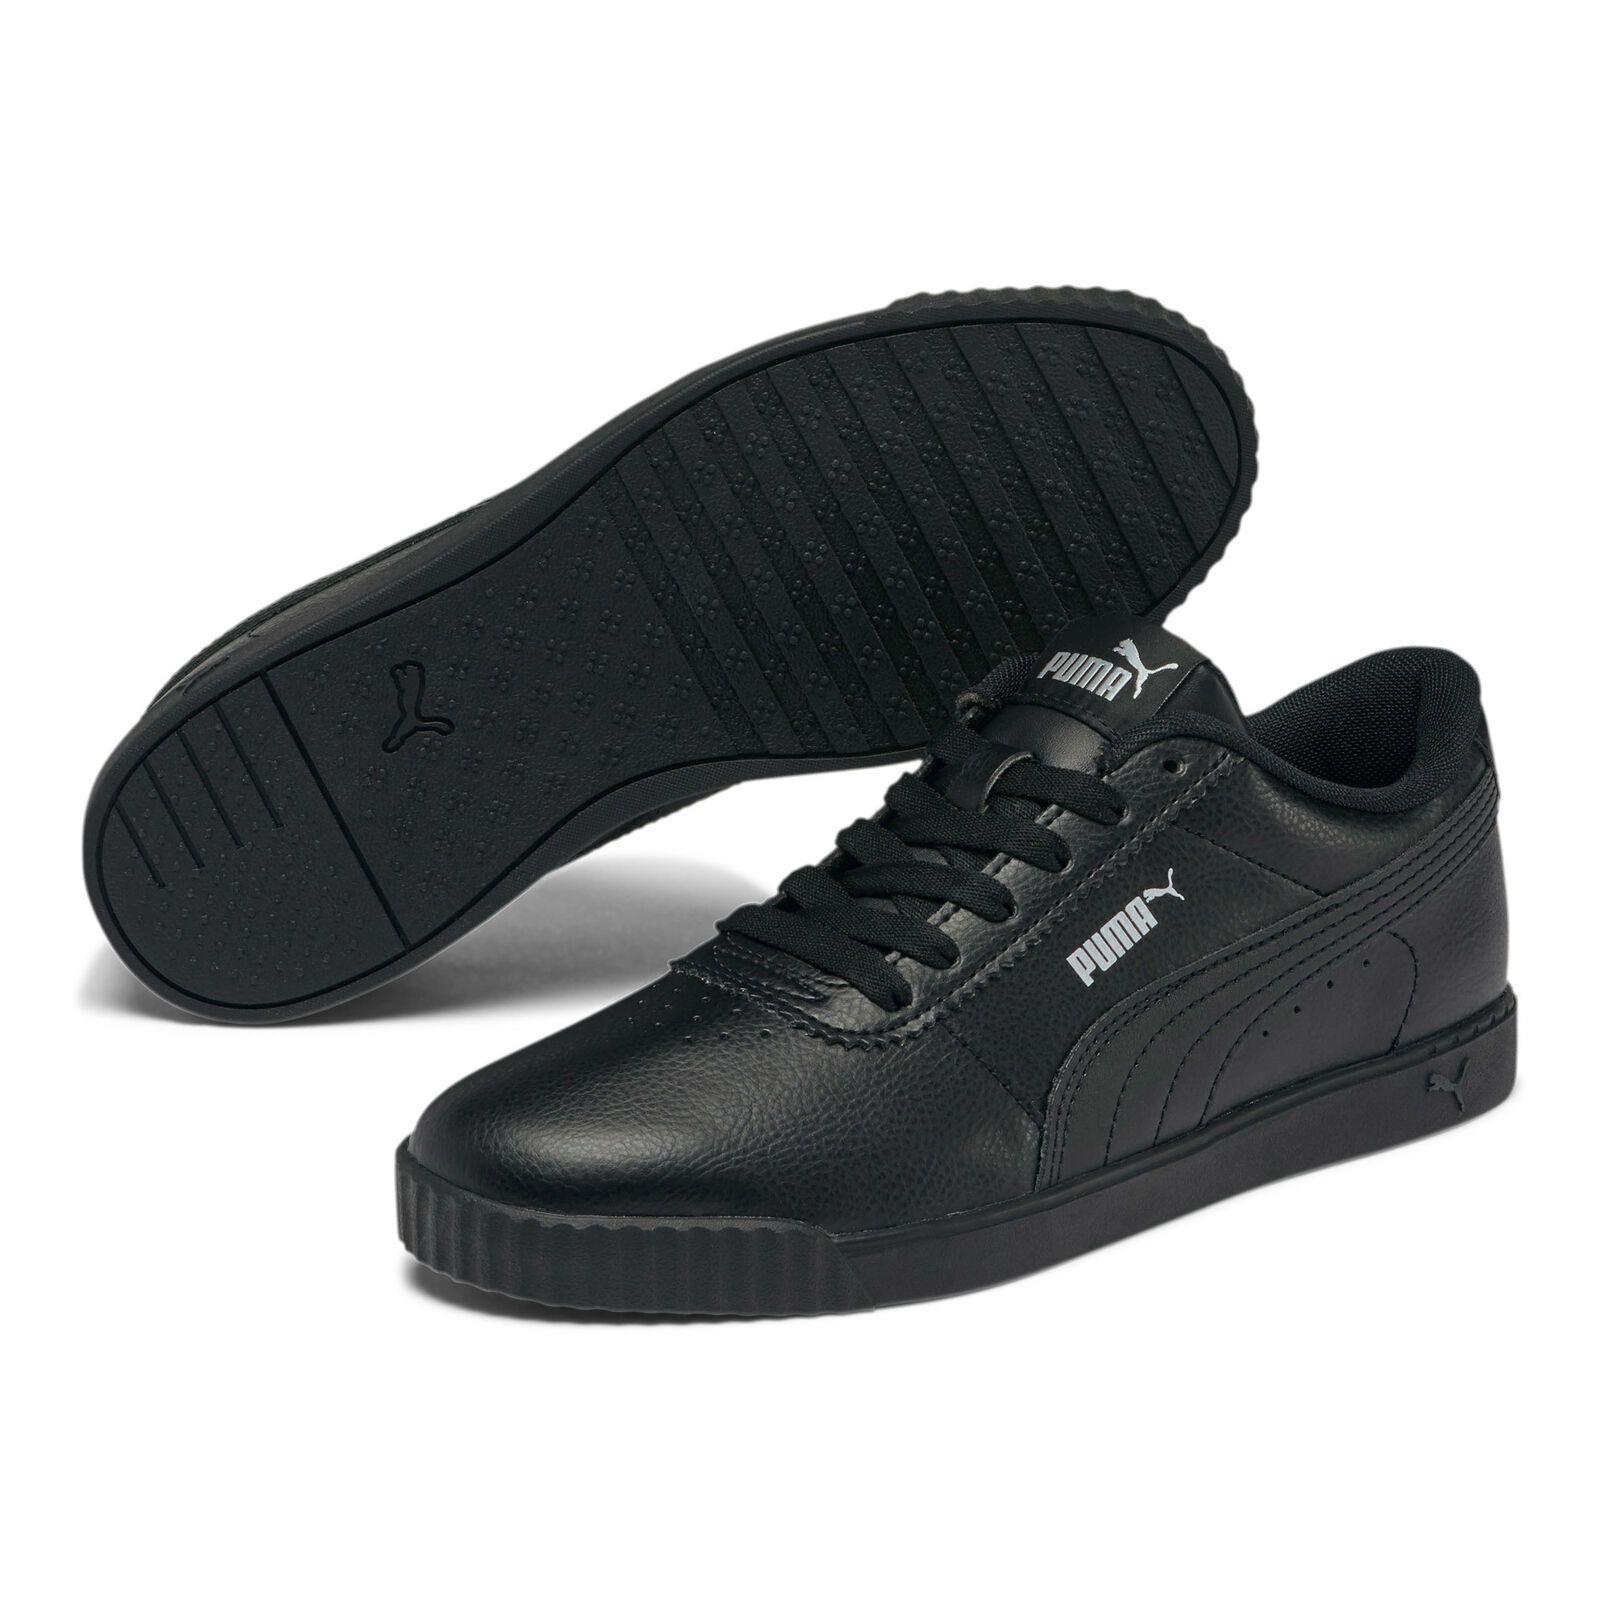 Womens sneakers, Basic shoes, Women shoes